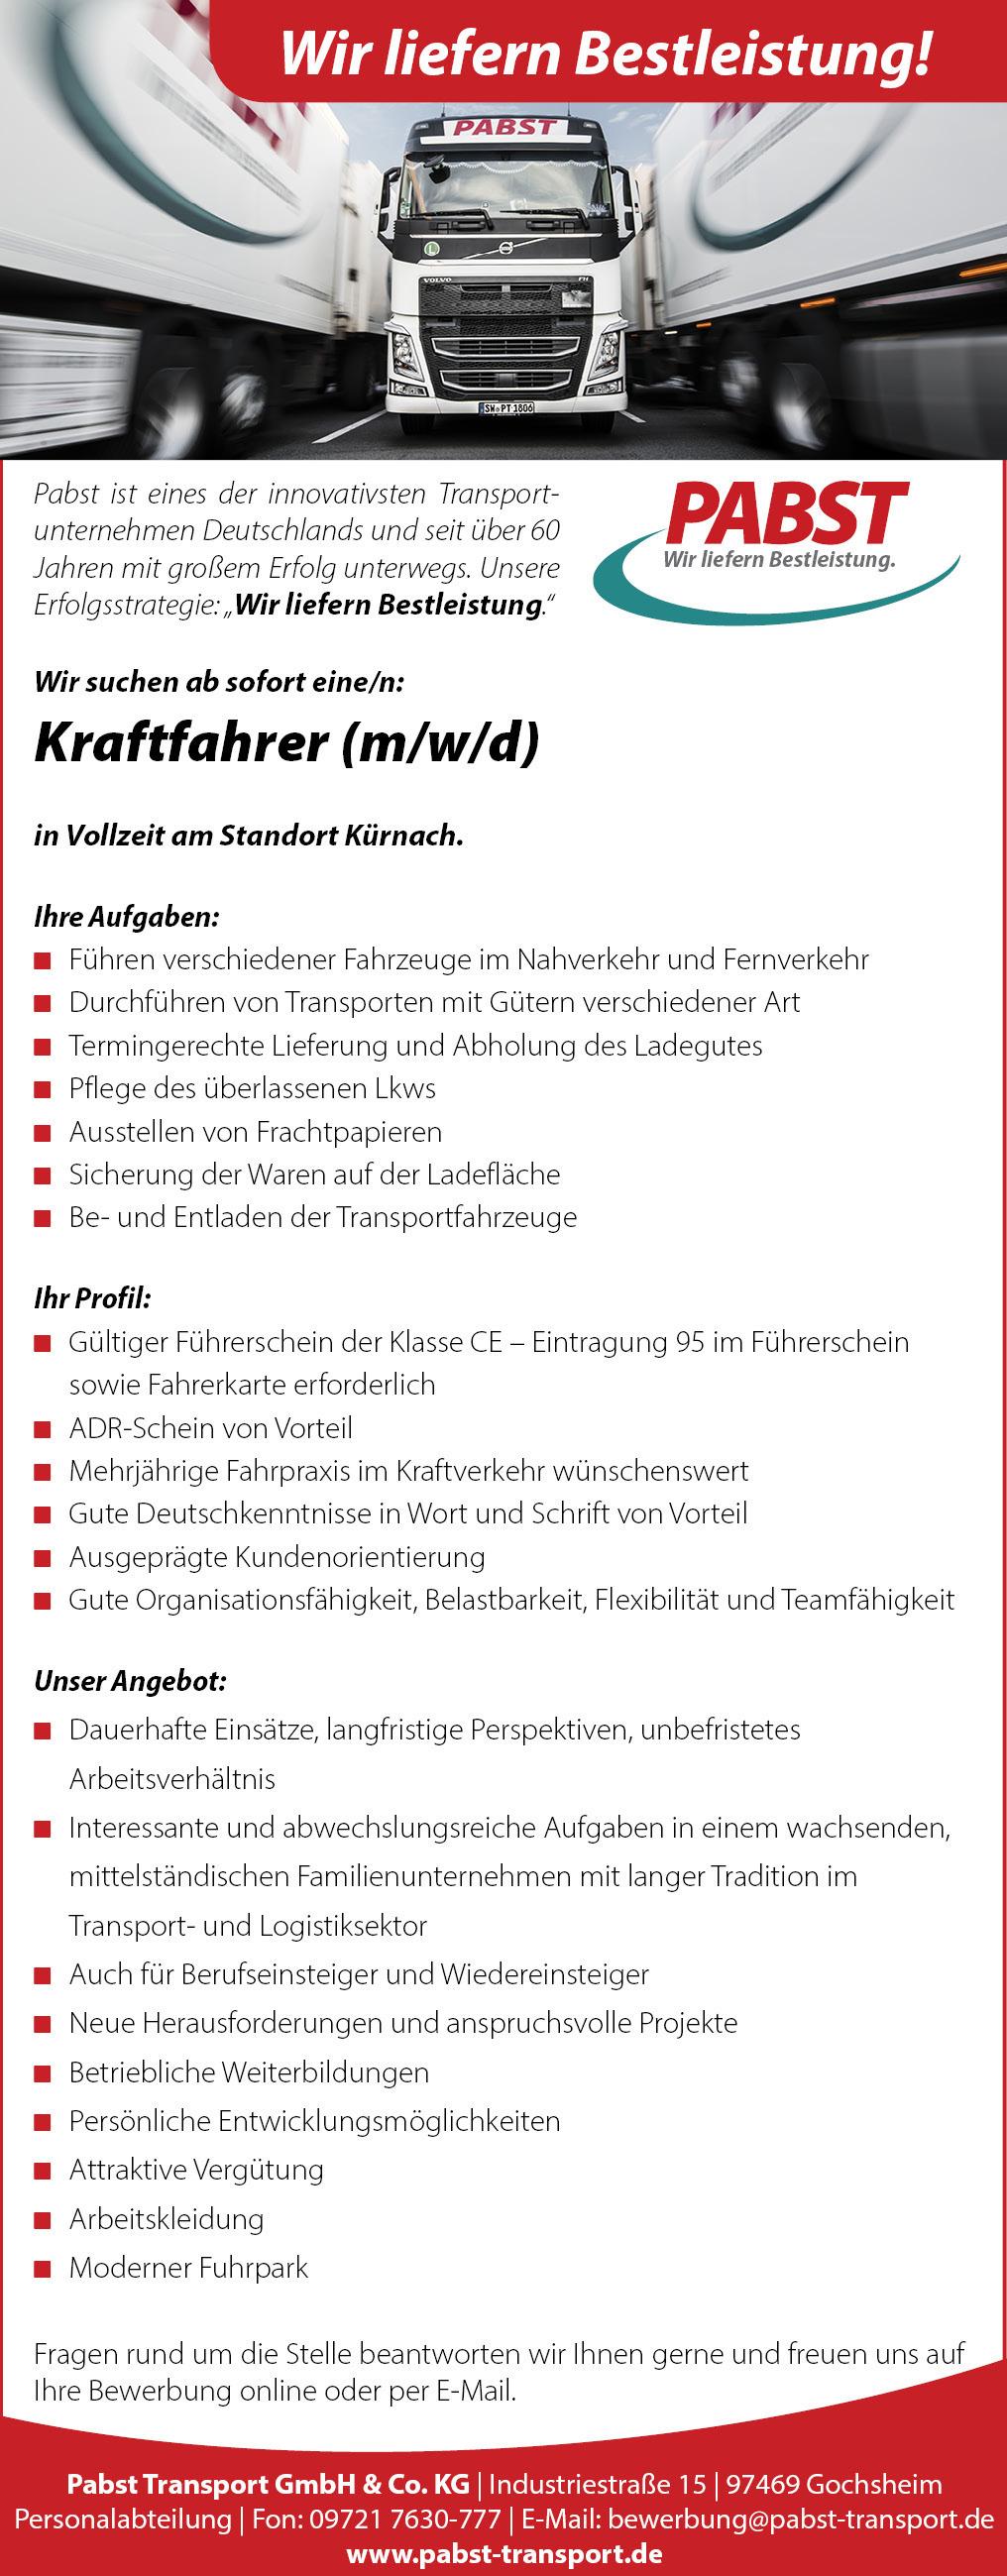 AZ-Kraftfahrer_Keurnach_86x220.jpg